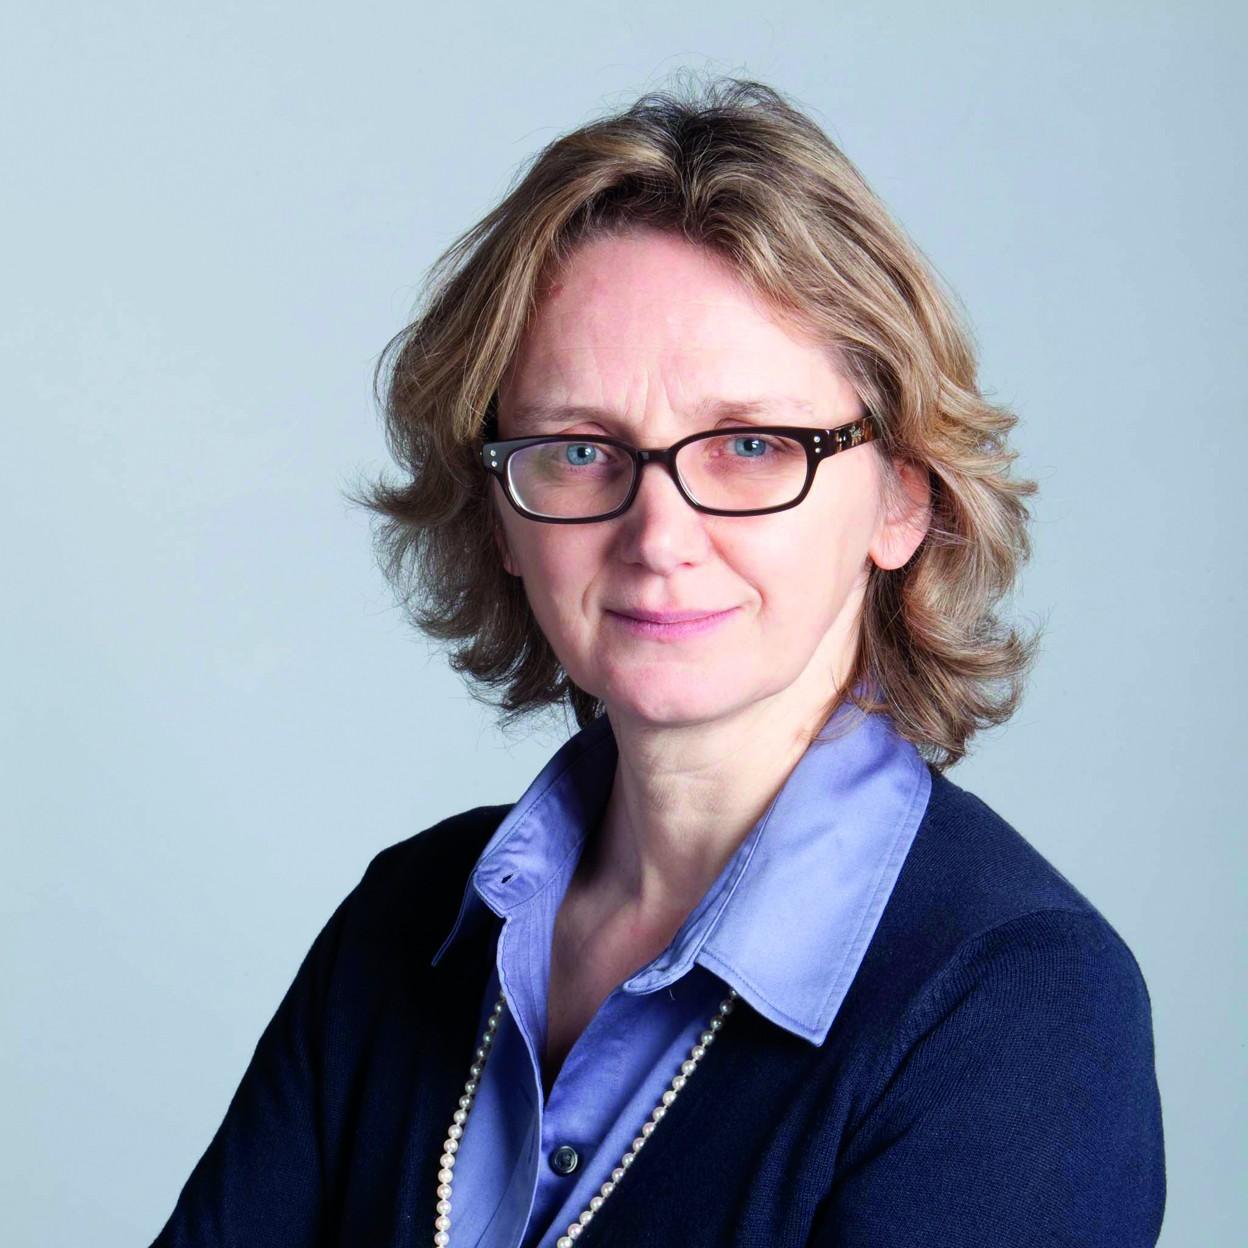 Wendy Philips